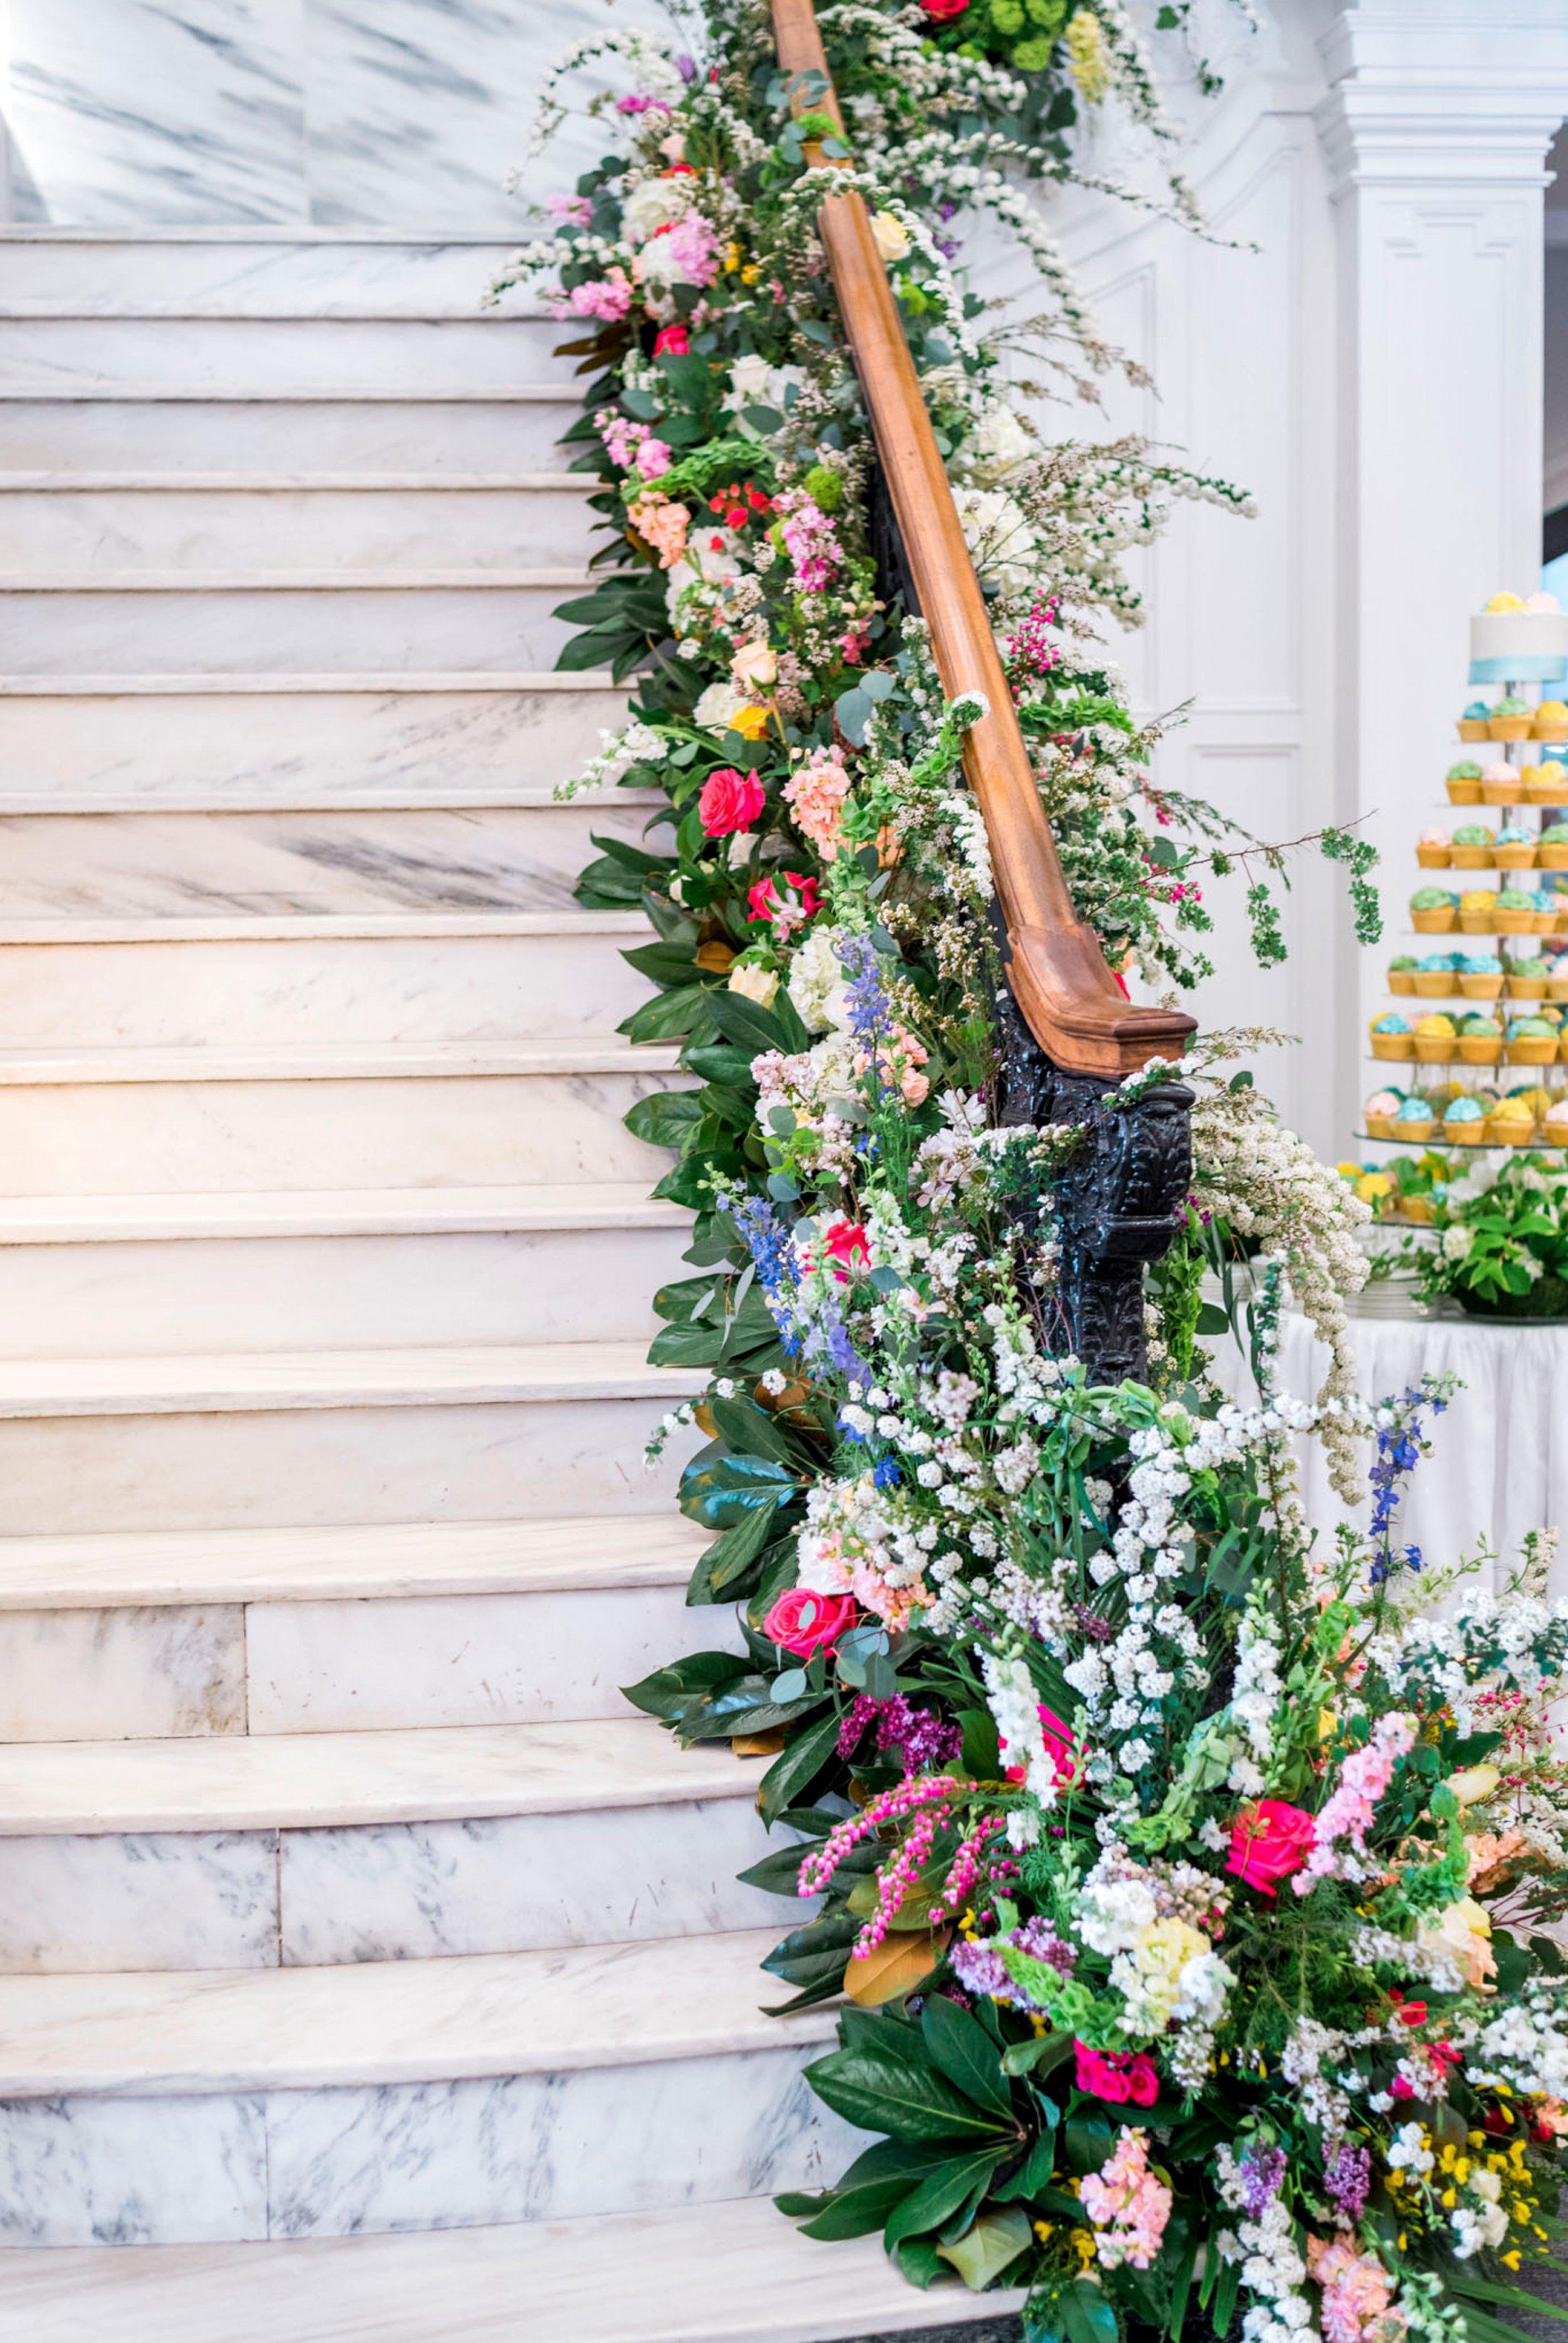 TheVirginianHotel_LynchburgVA_TheVirginianHotelWedding_Virginiaweddingphotographer_Lynchburgvawedding 5.jpg